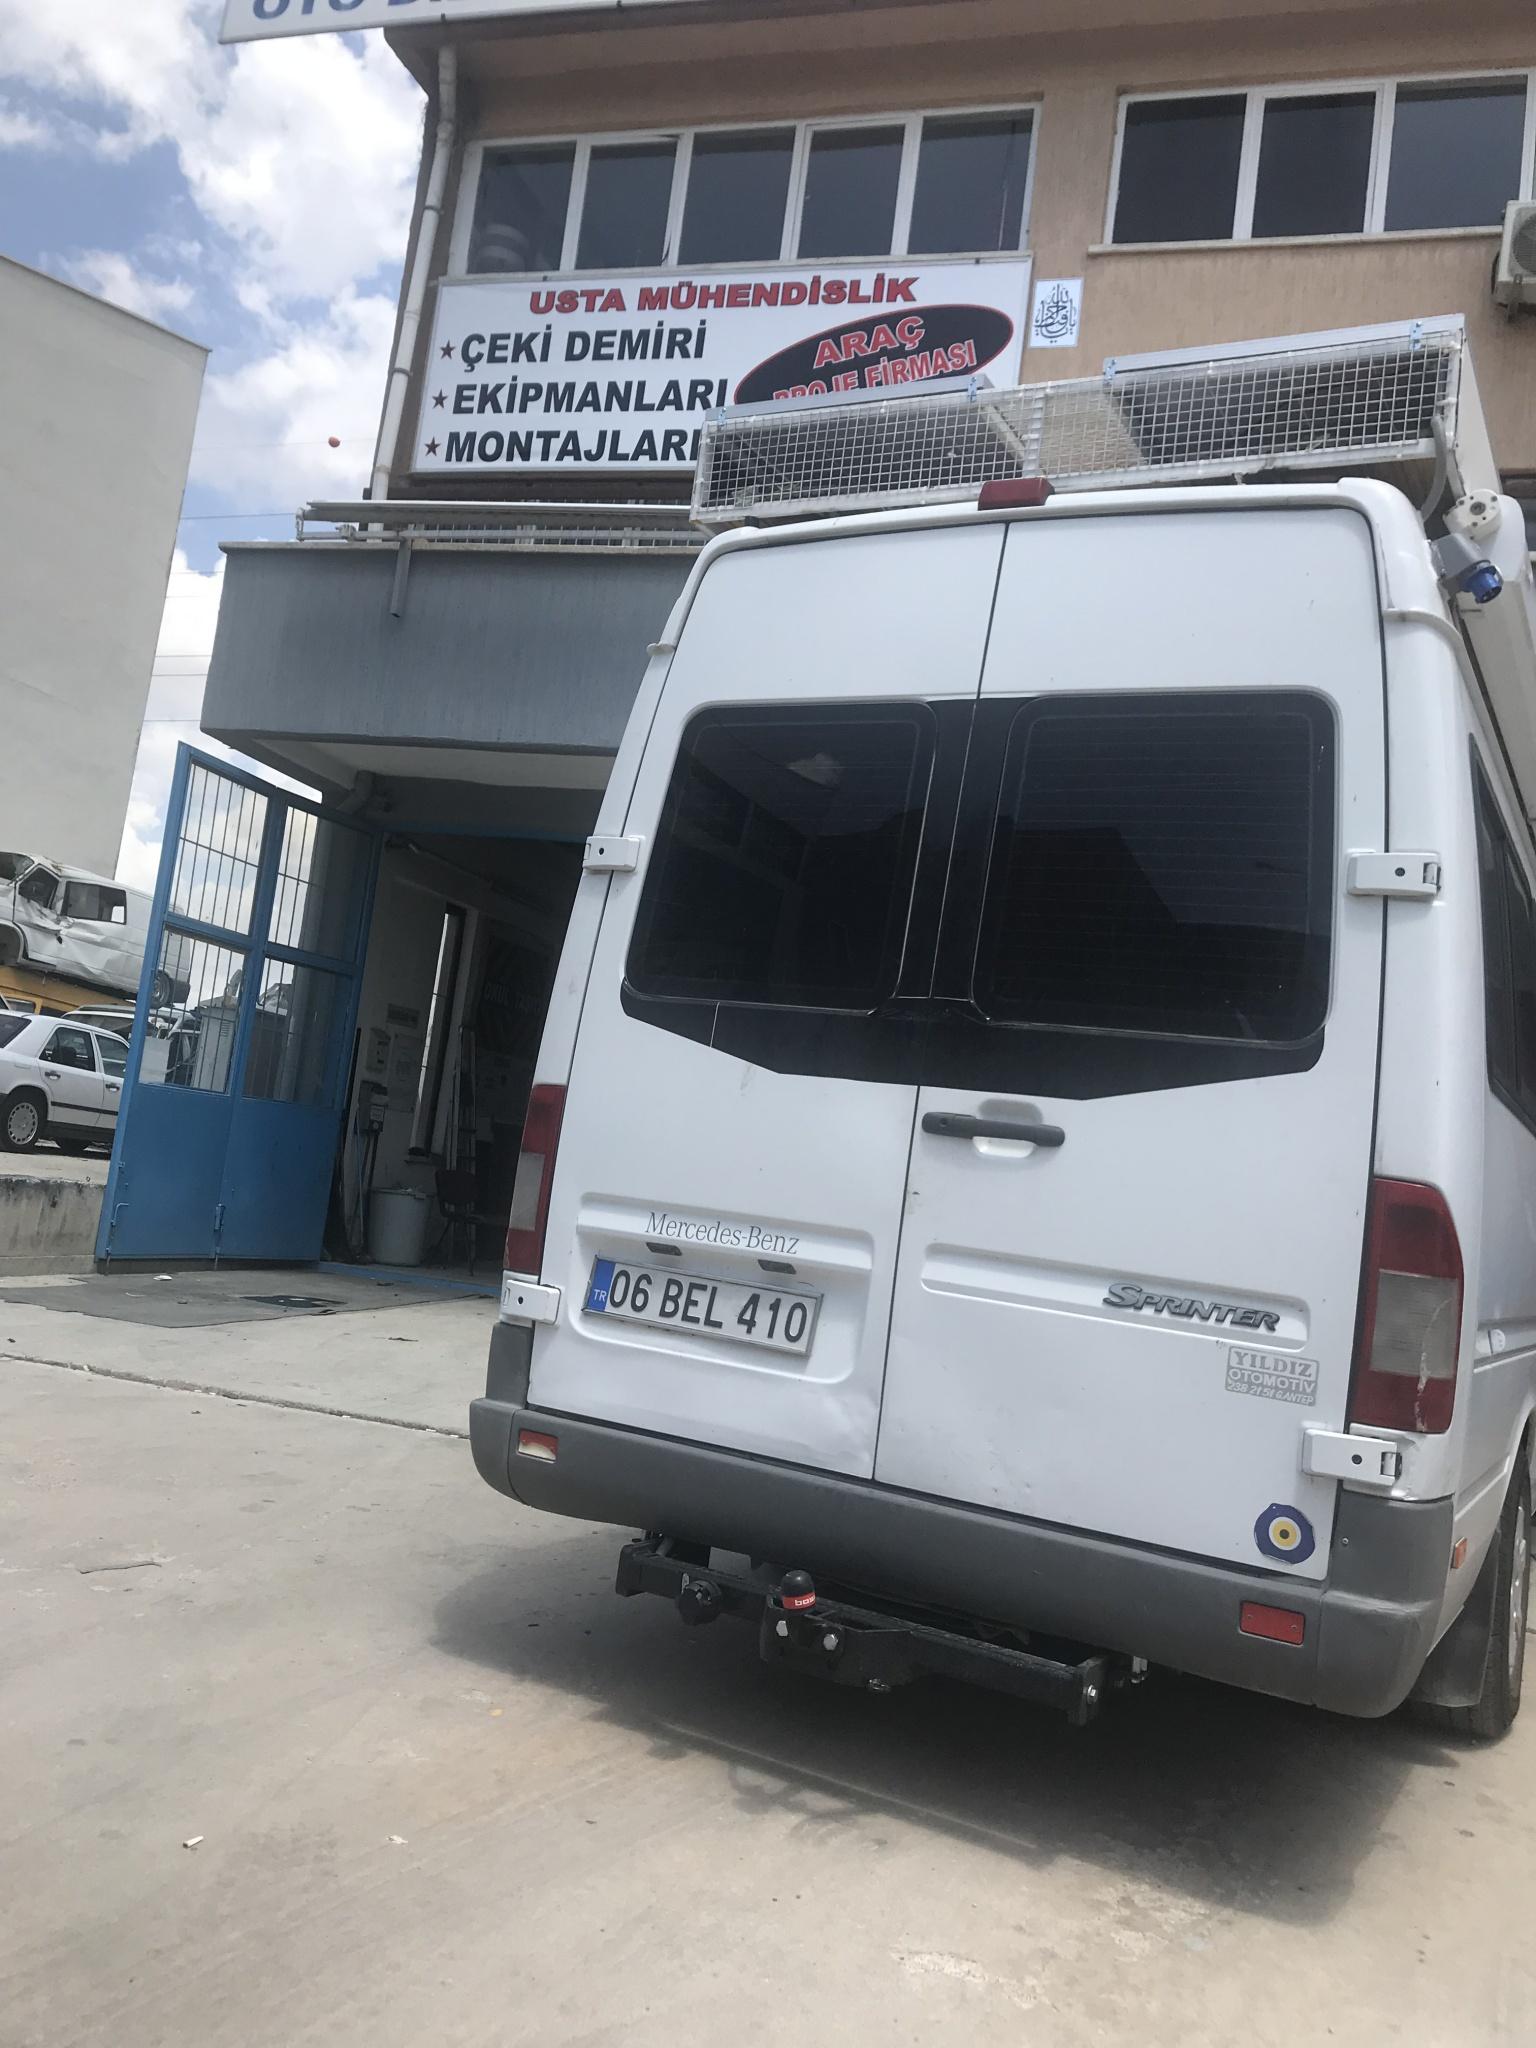 USTA MÜHENDİSLİK OTO DİZAYN +ÇEKİ DEMİRİ FİRMASI ANKARA 054